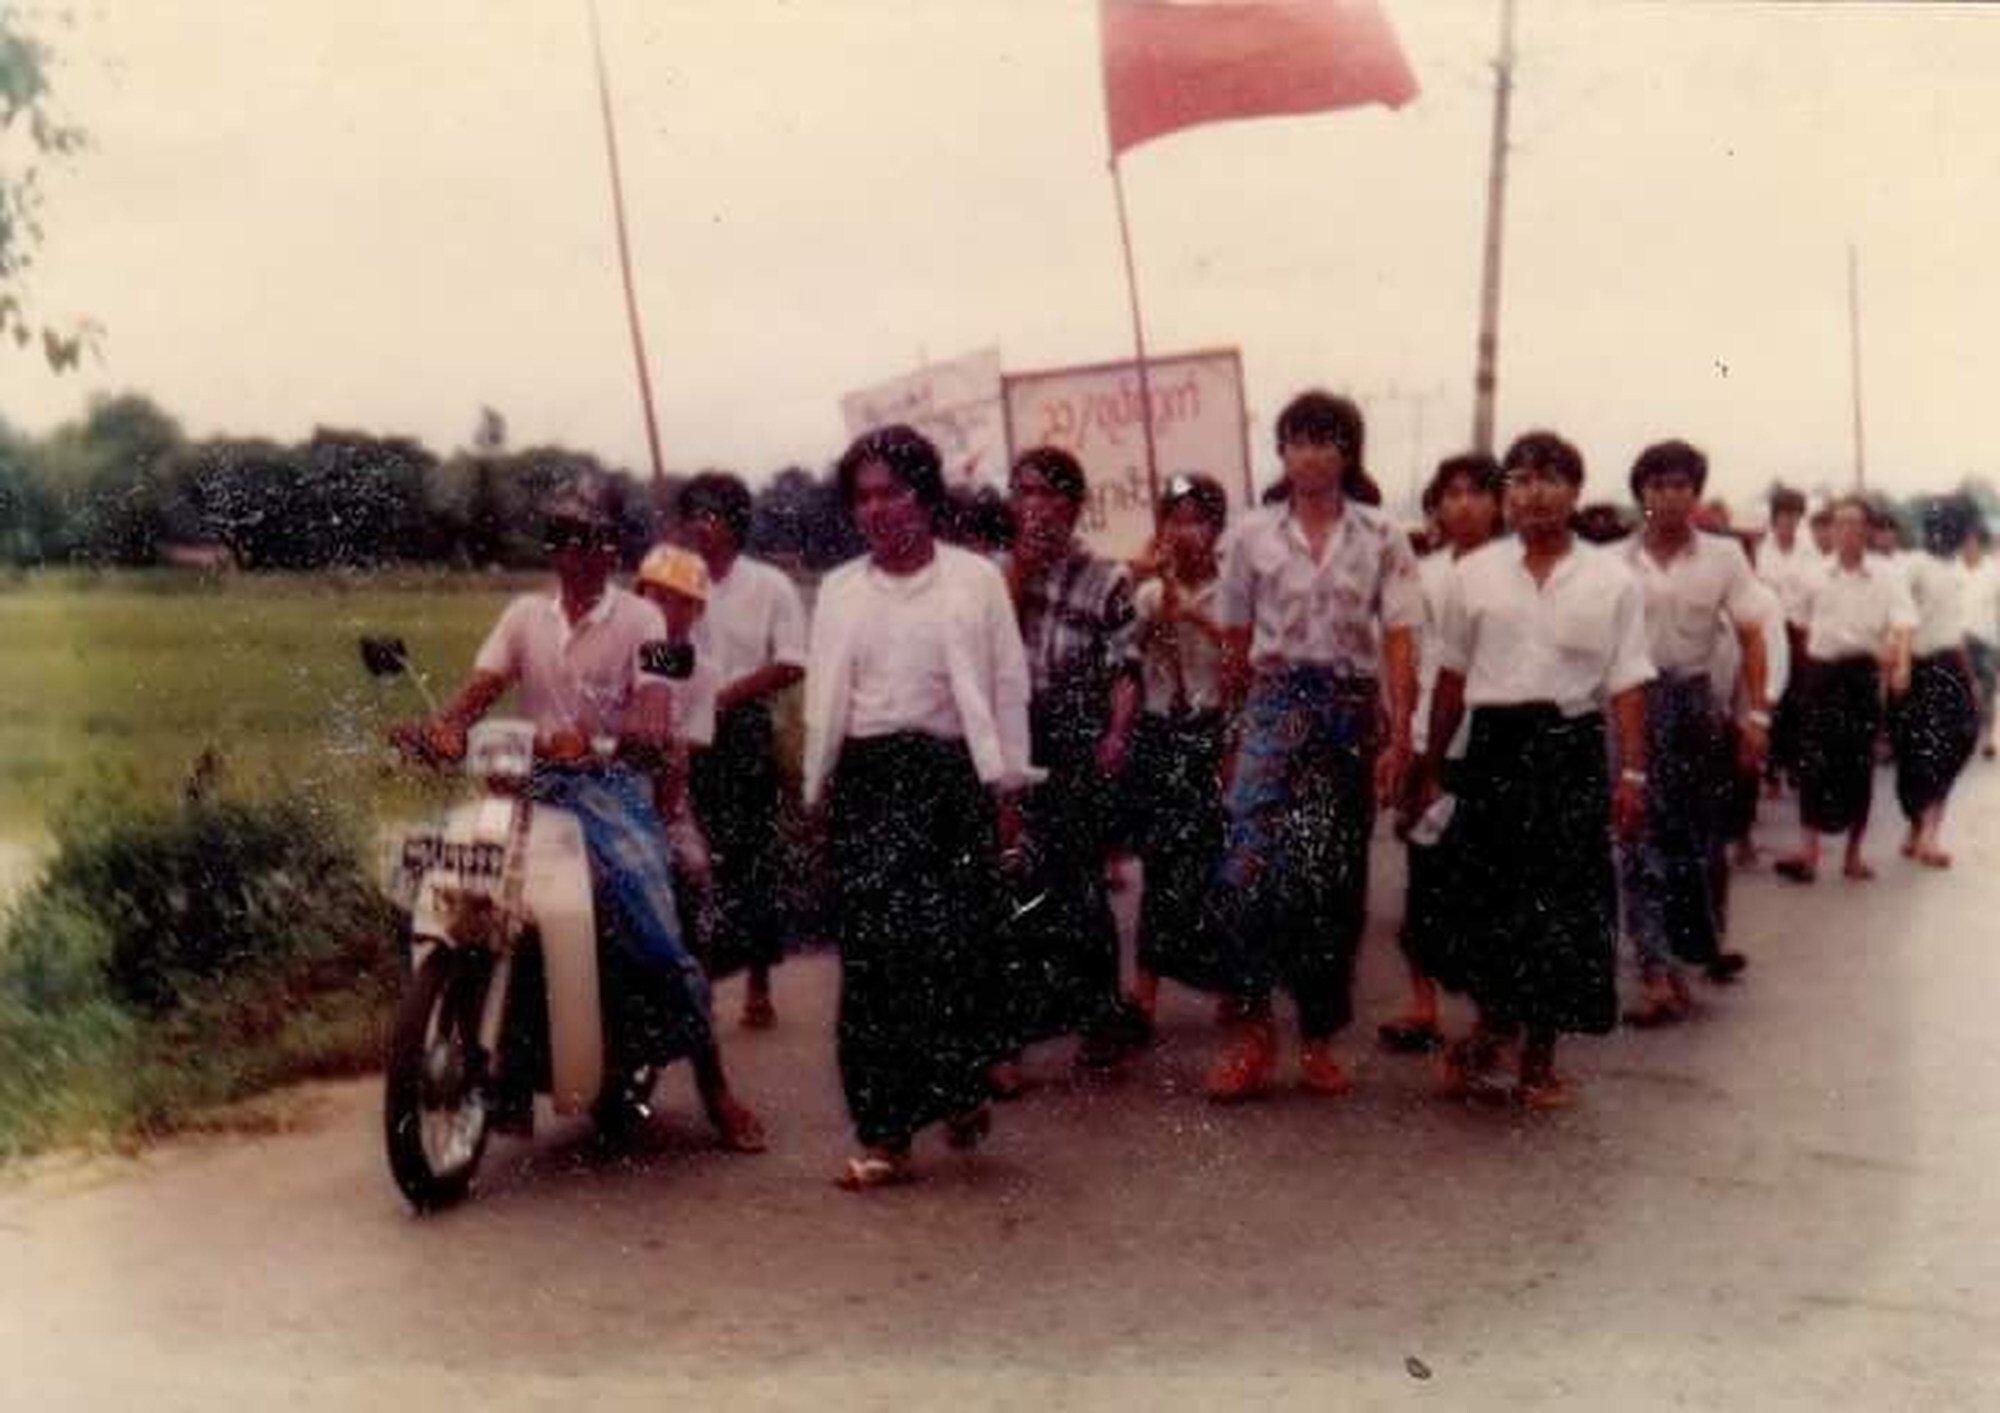 North Okkalapa during 1988 uprising. Photo: History of Burma Museum